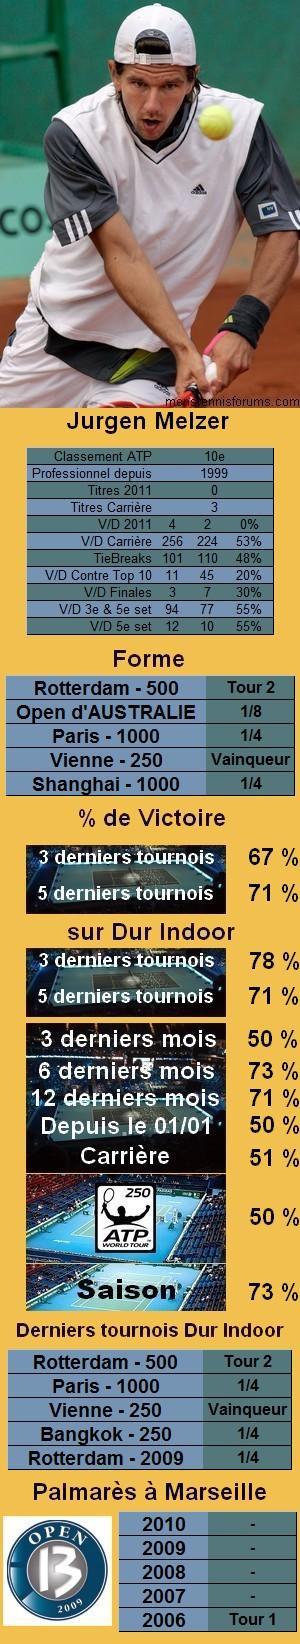 Statistiques tennis Jurgen Melzer